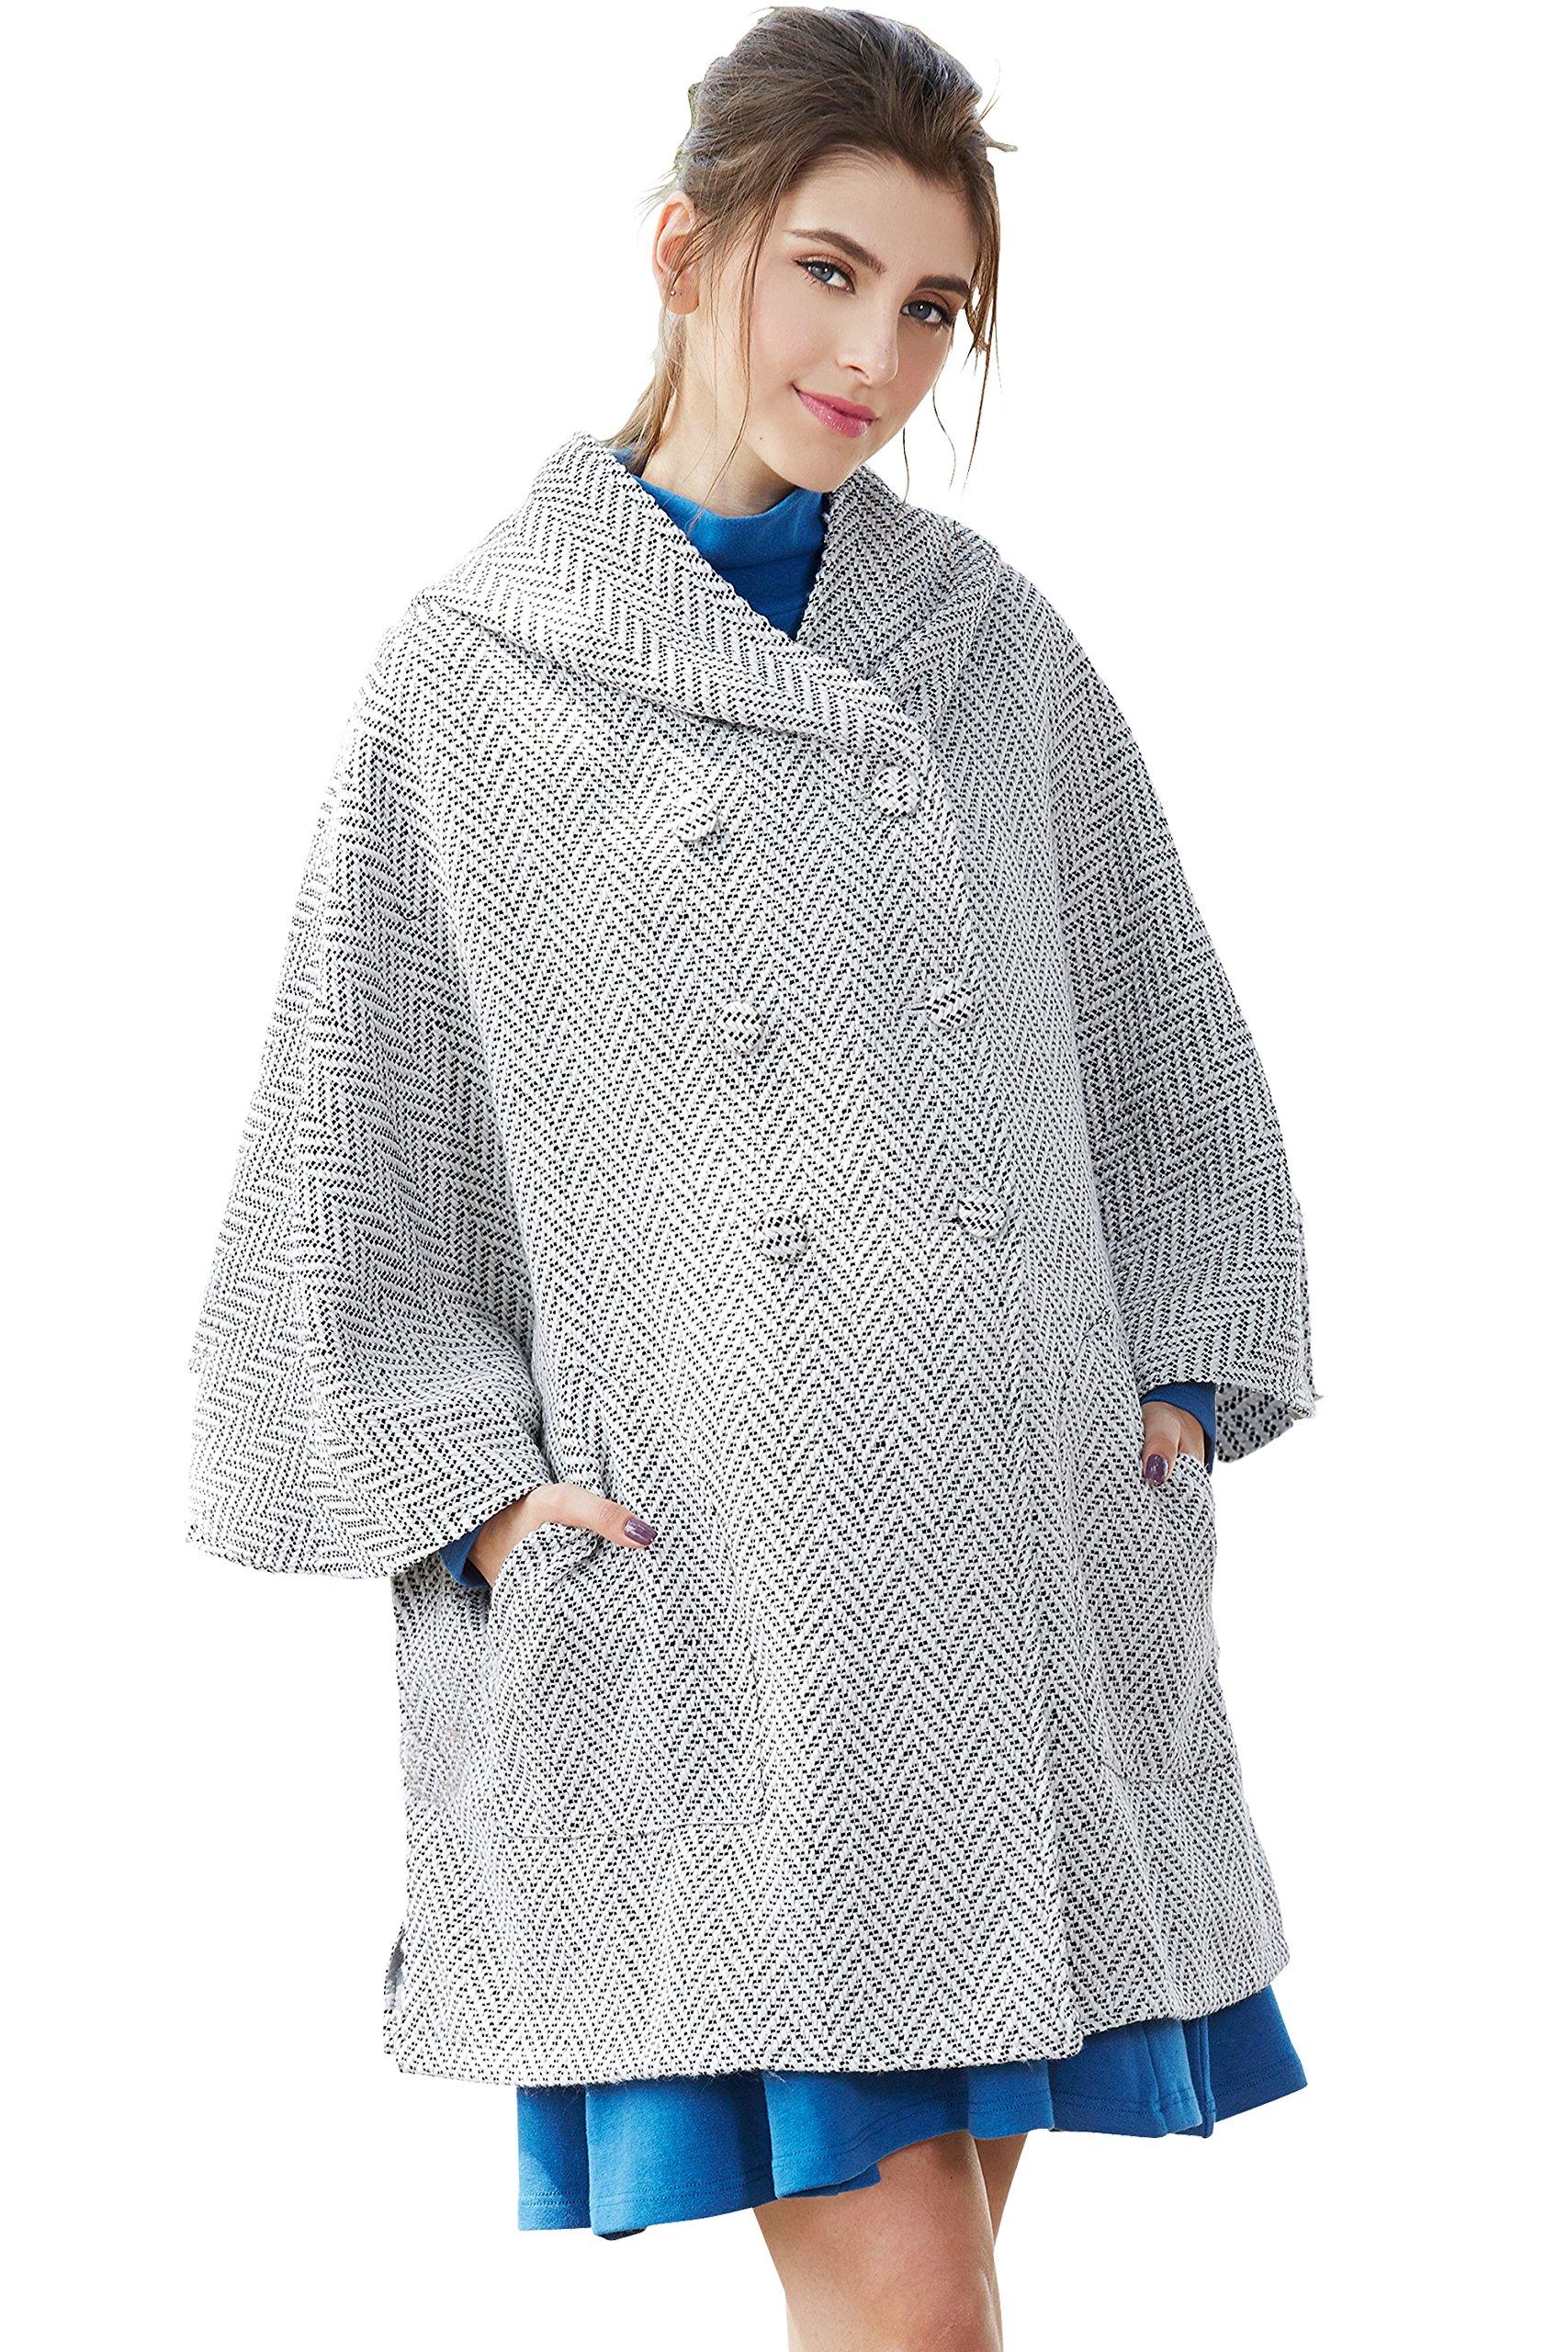 Sweet Mommy Maternity and Babywearing Hooded Tweed Poncho Coat WhiteF